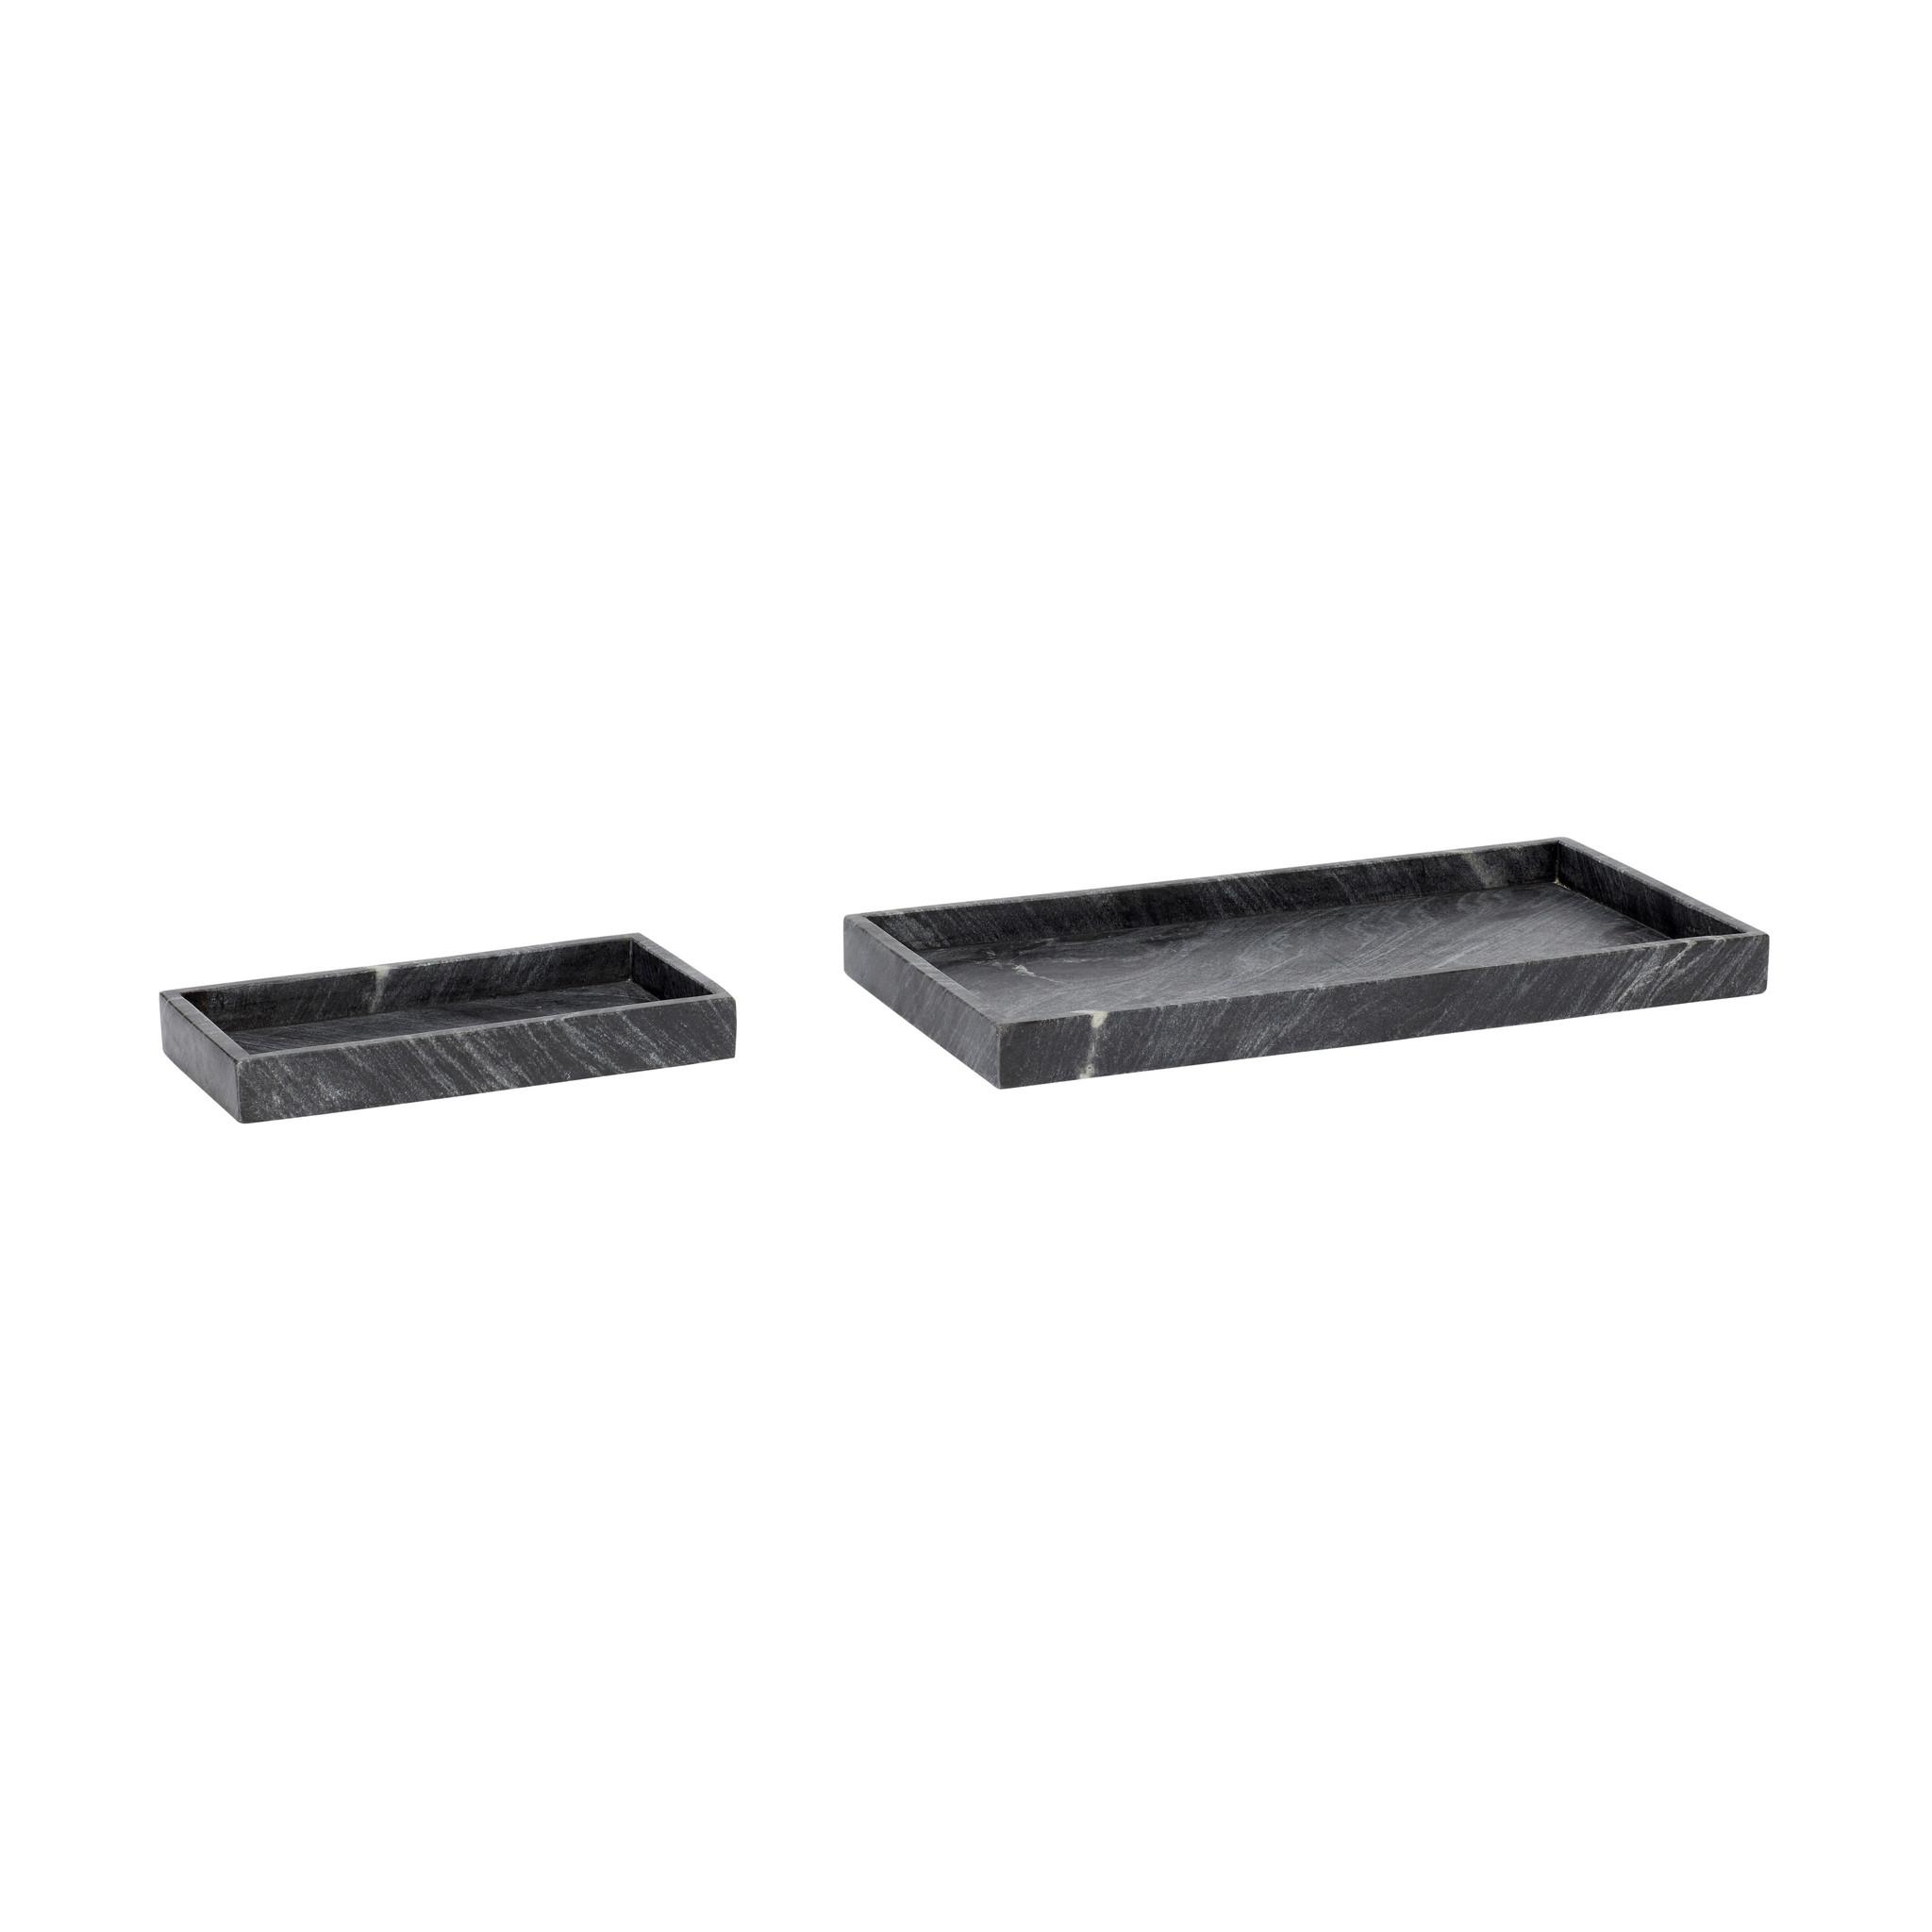 Hubsch Dienbladenset, marmer, zwart, set van 2-510227-5712772052662